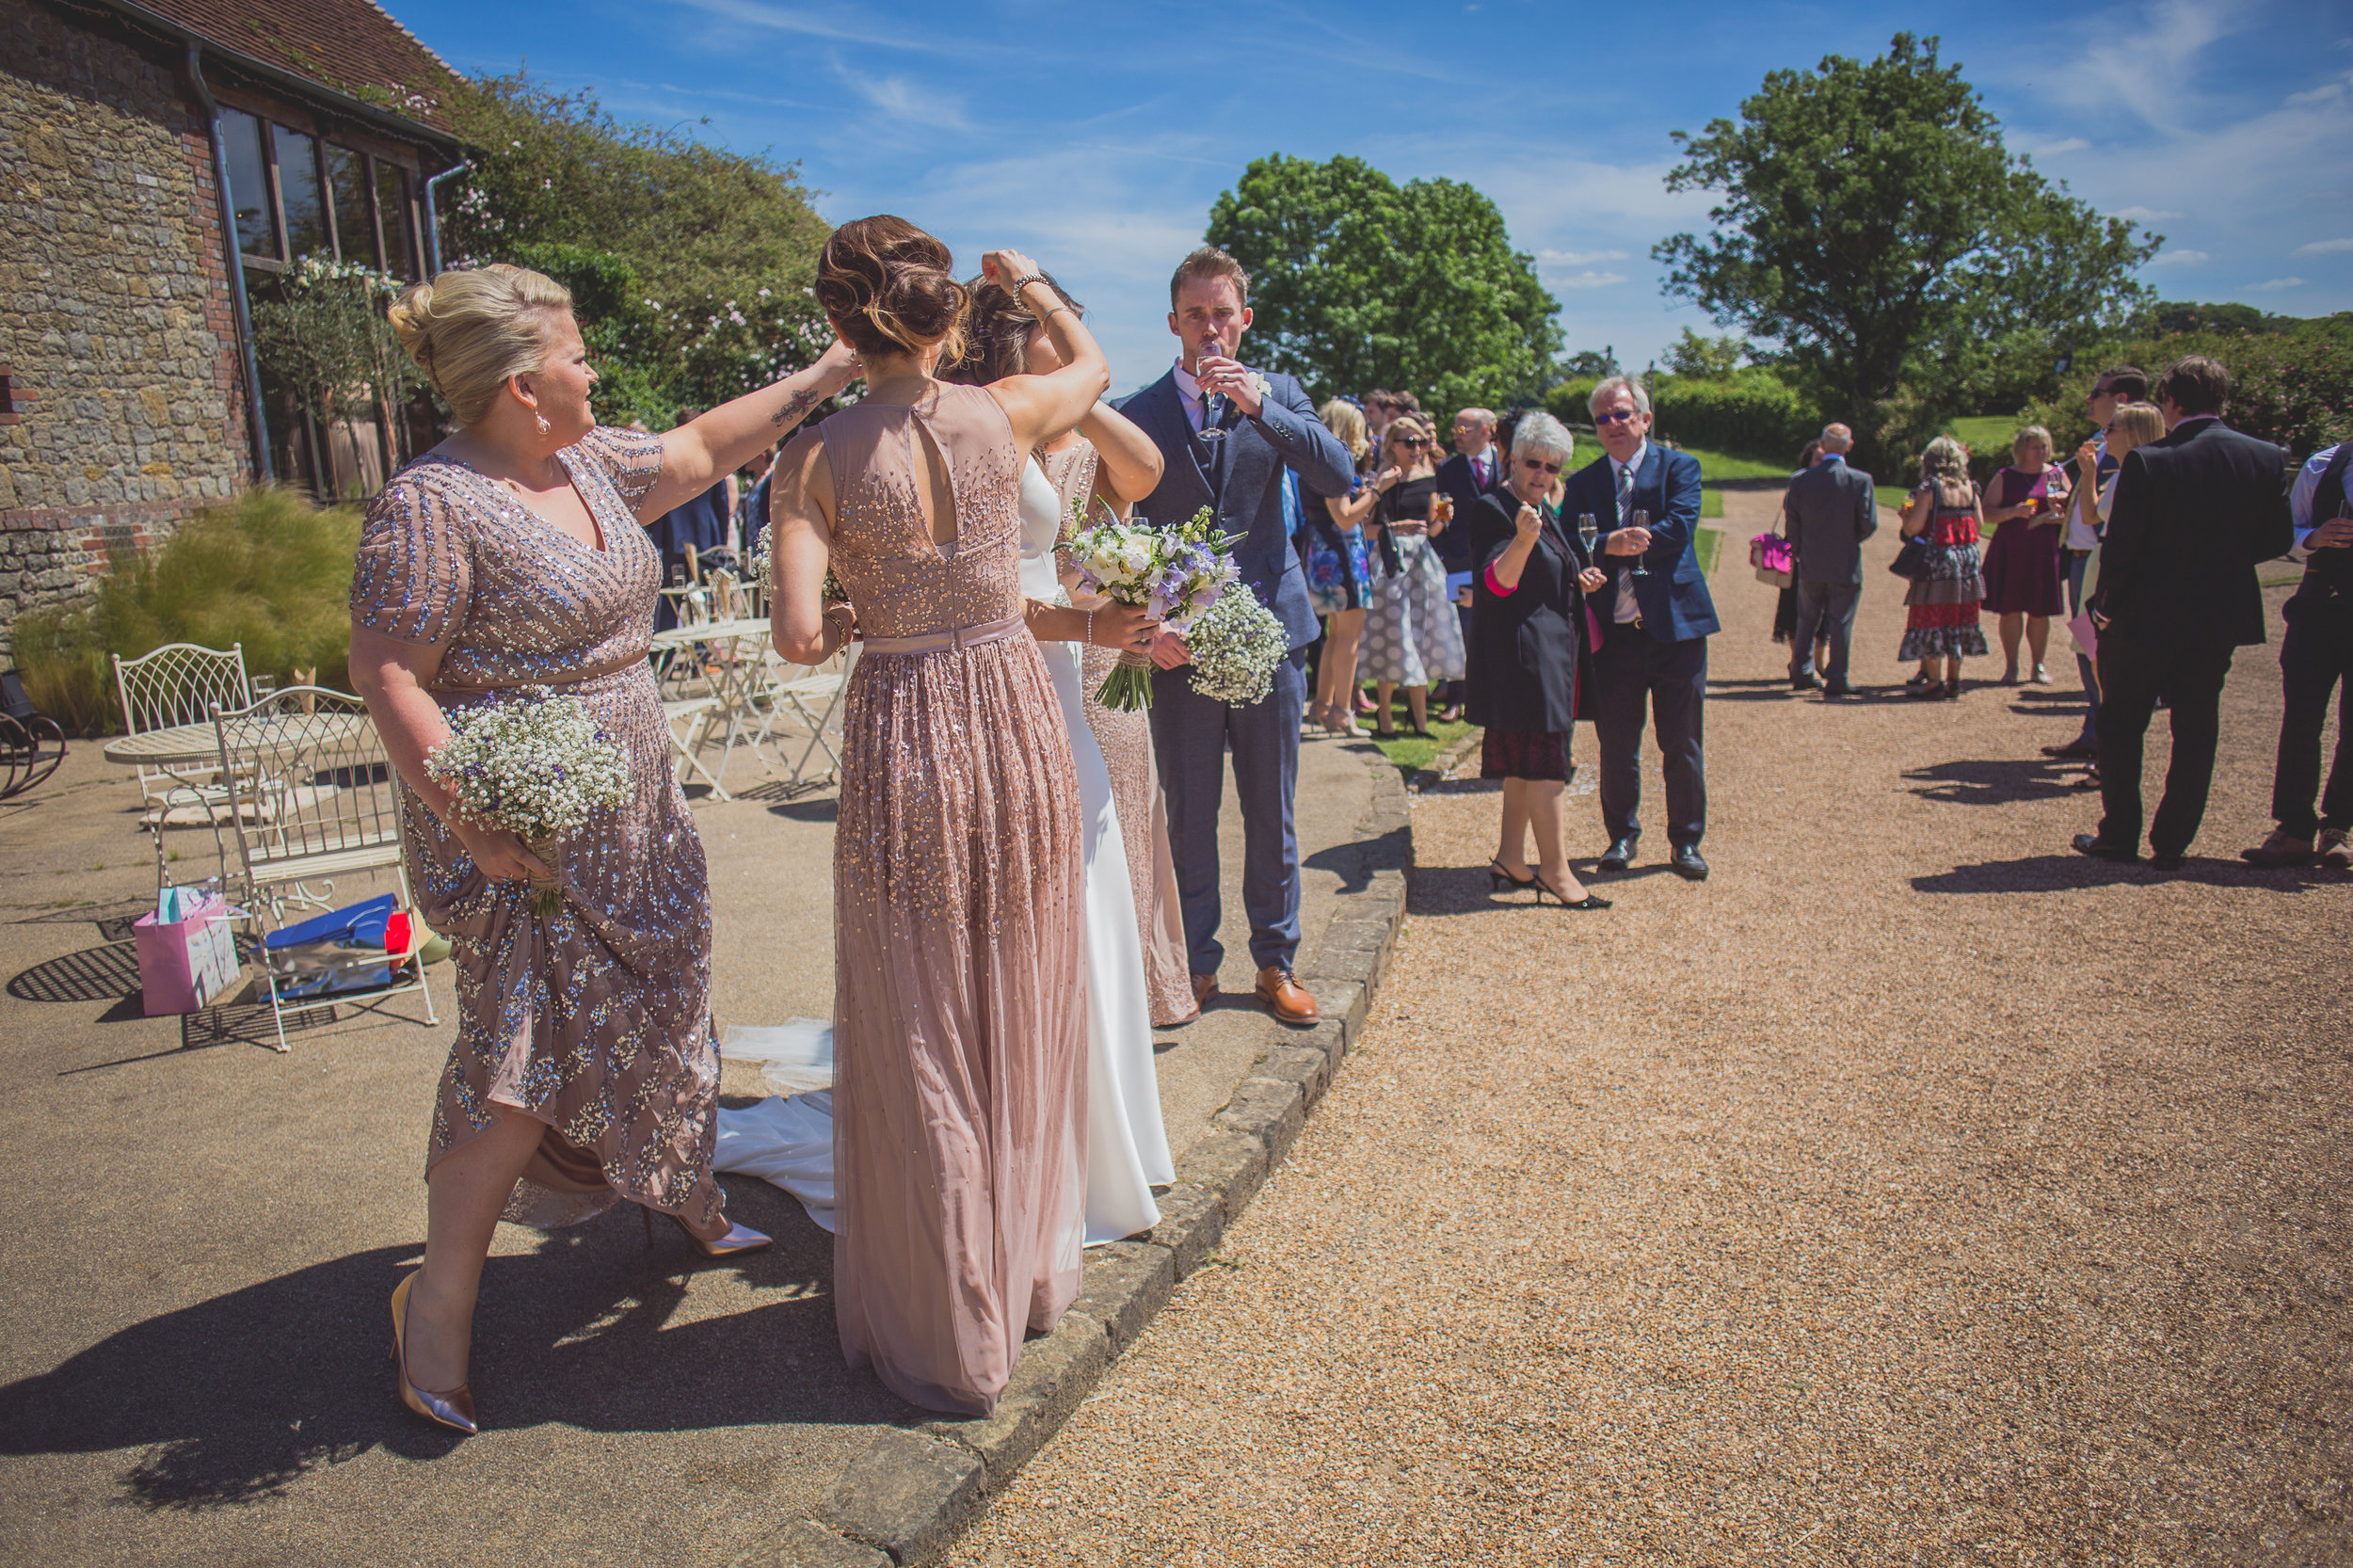 Grittenham Barn female wedding photographers west sussex petworth social-80.jpg